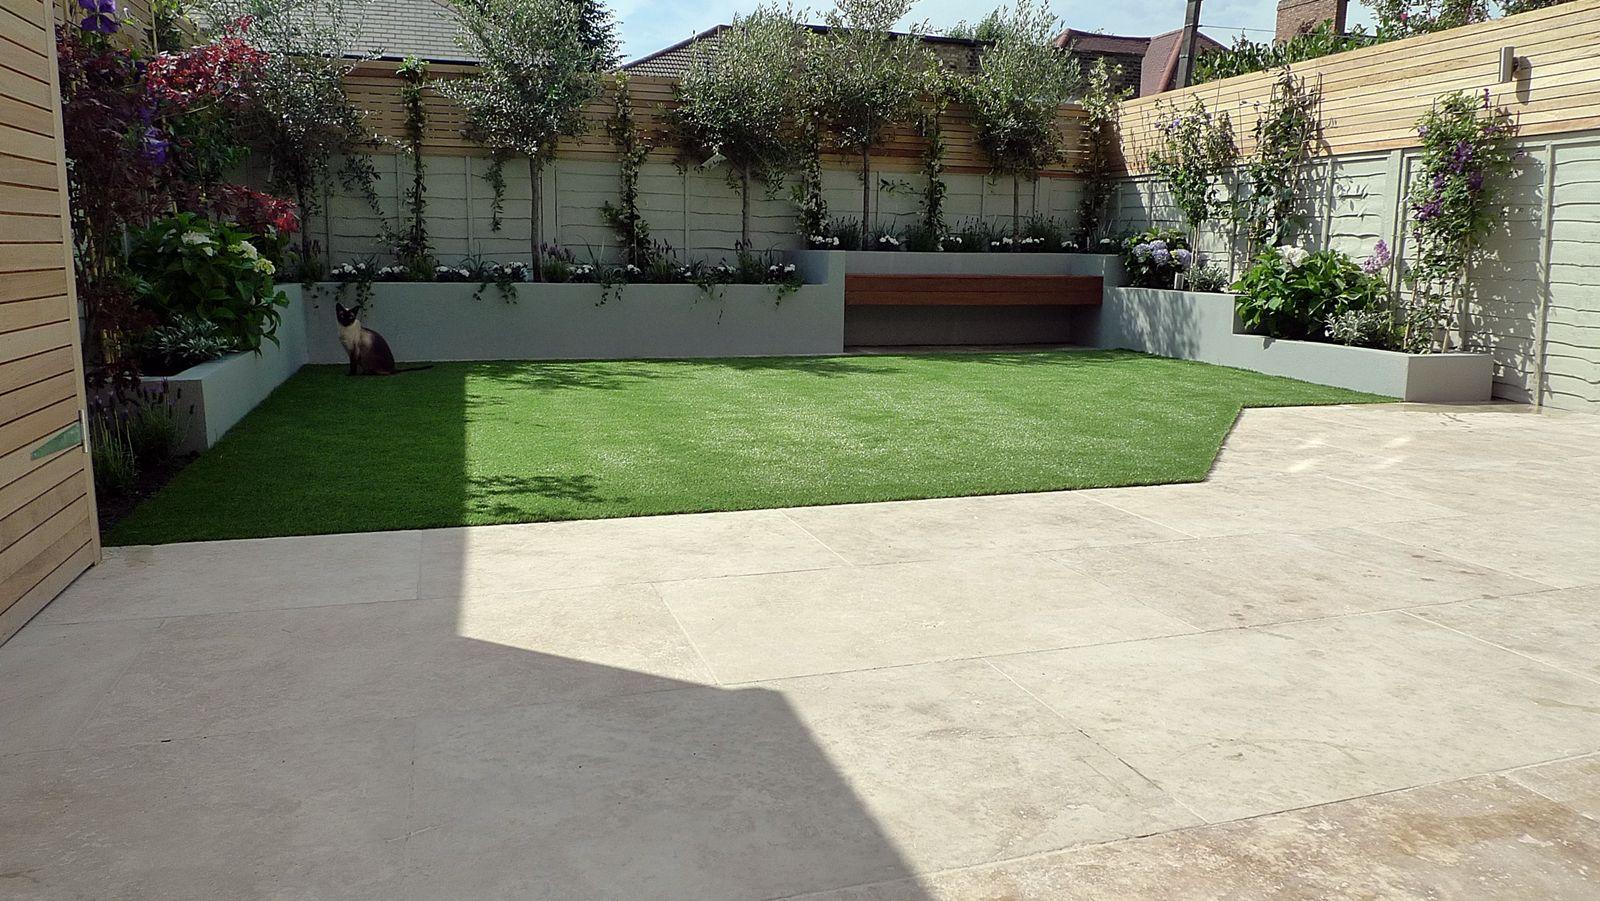 Modern garden design artificial grass raised beds bespoke storage